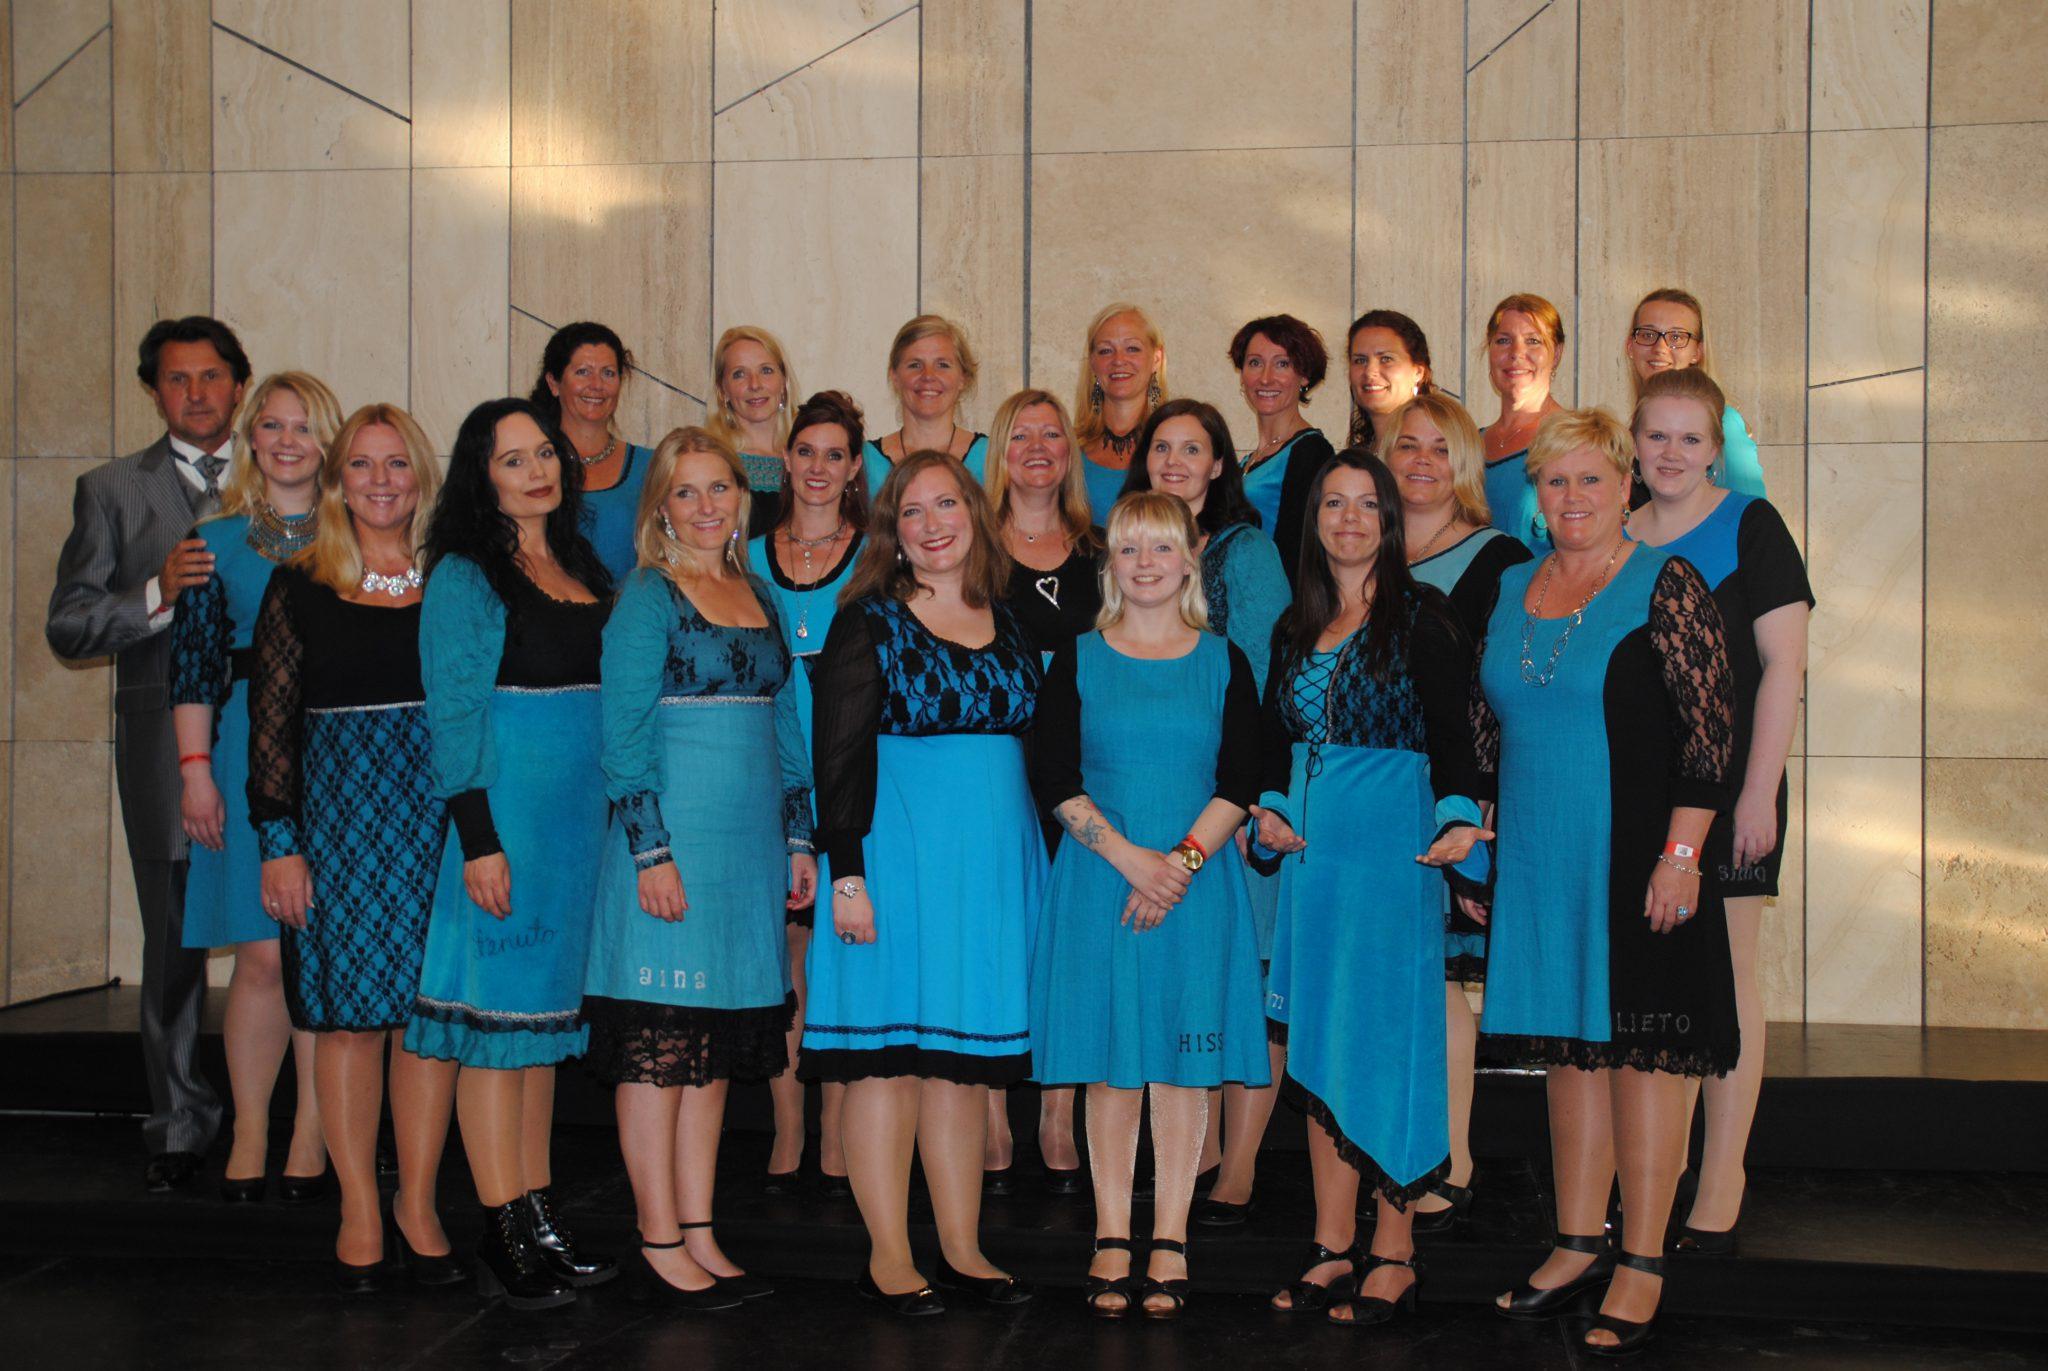 Budapest International Choral Celebration